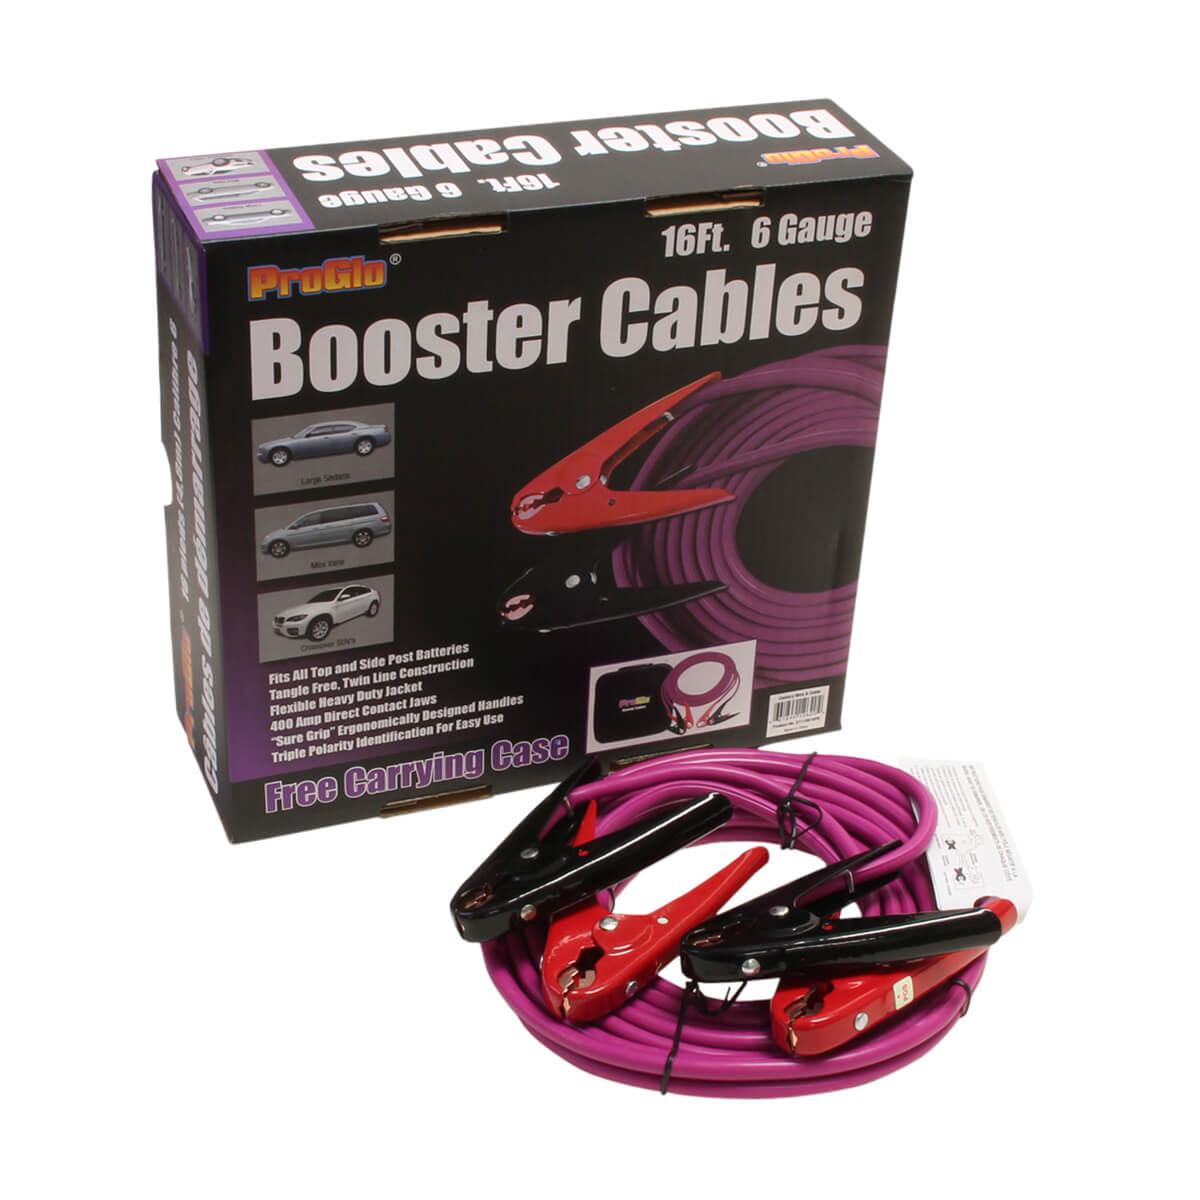 16' Pro Glo® Booster Cables, 6 Ga. w/Case